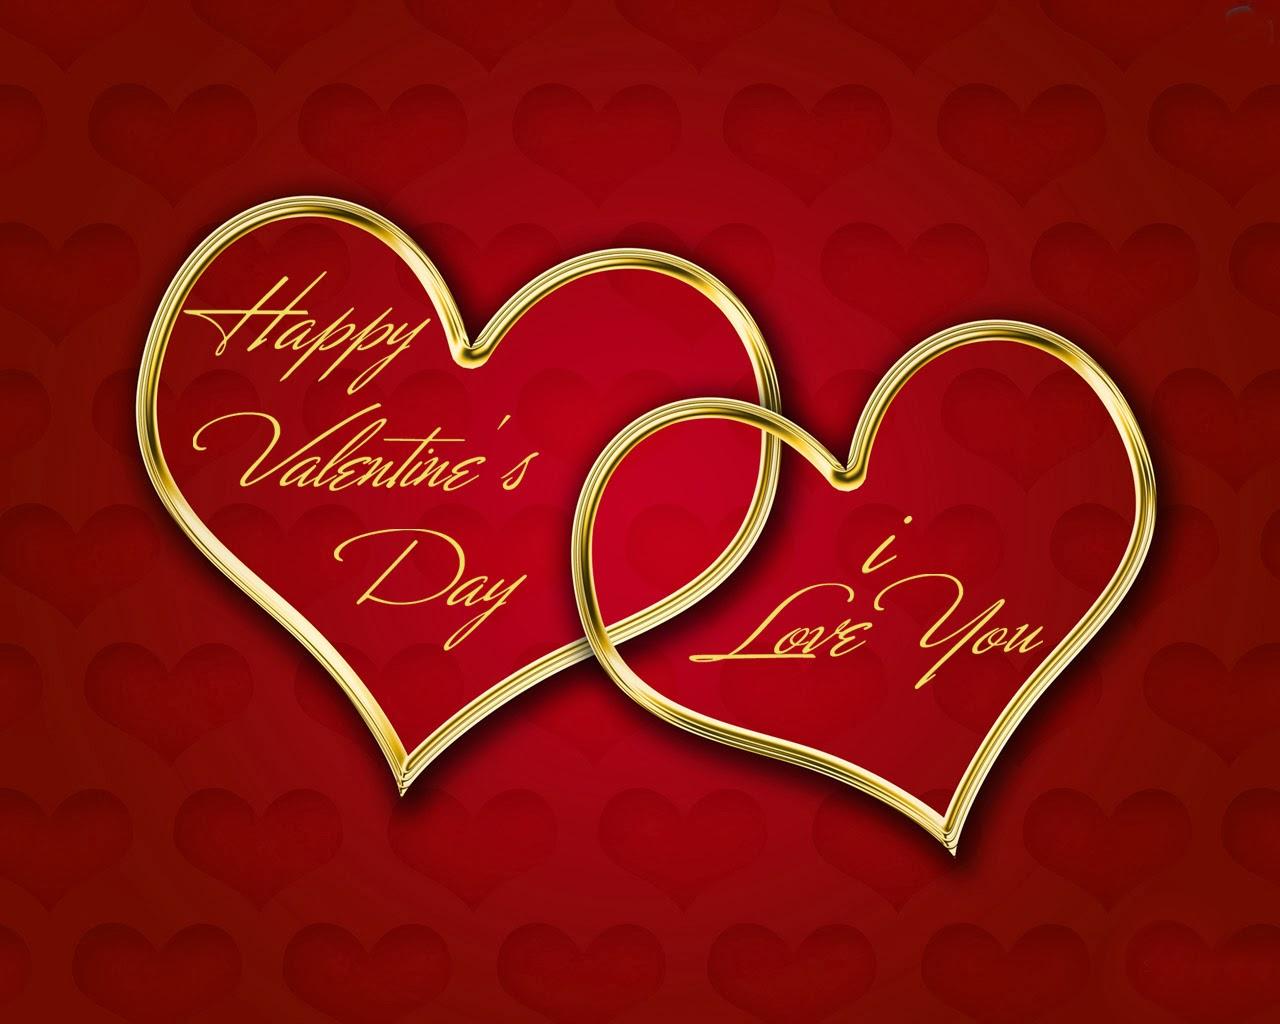 Happy-valentine-day-i-love-you